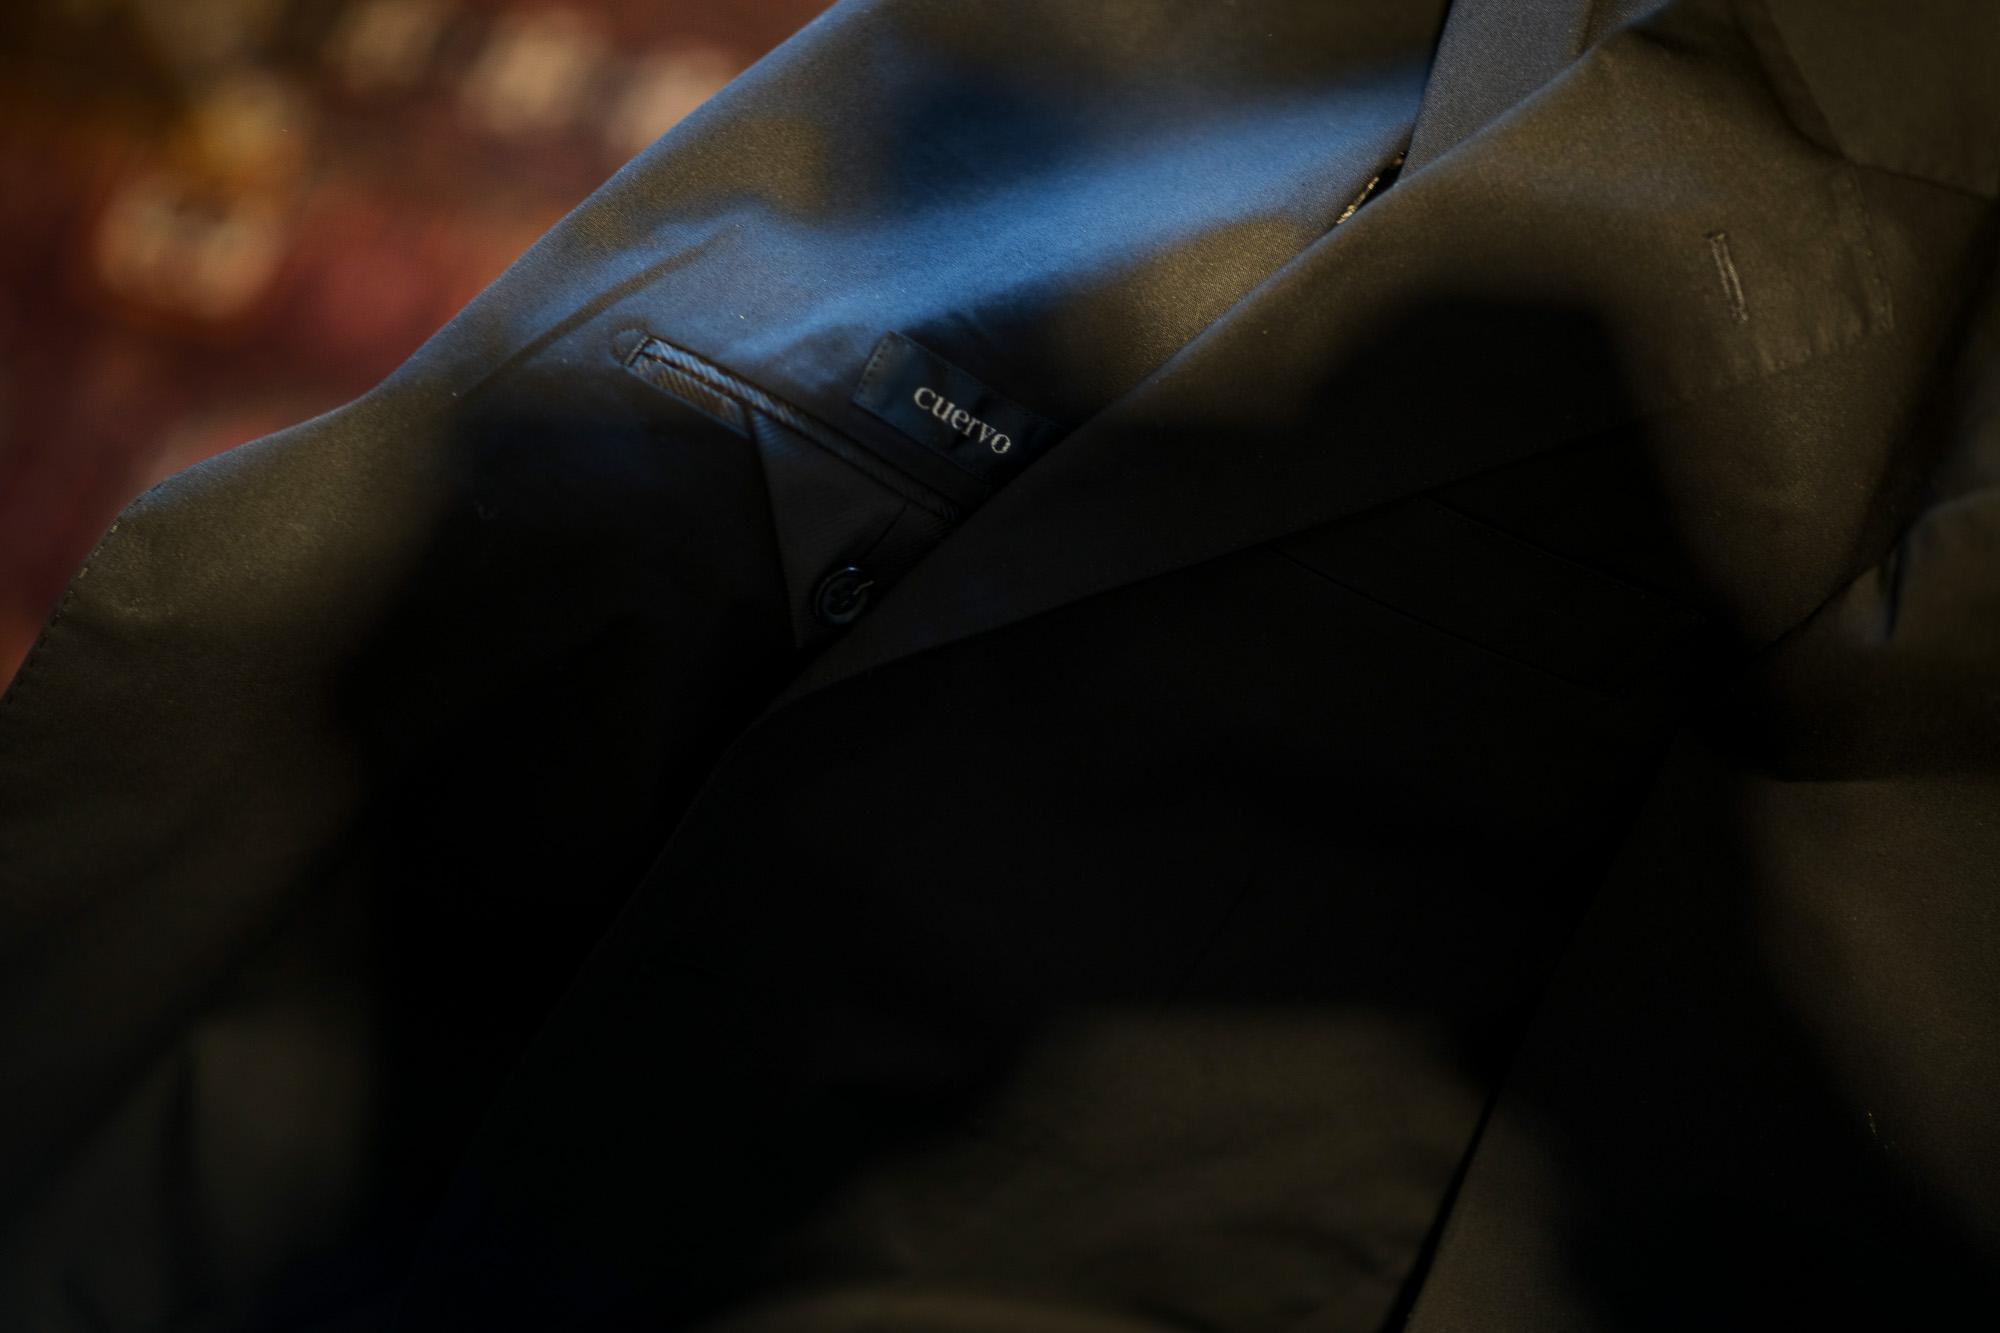 Cuervo (クエルボ) Sartoria Collection (サルトリア コレクション) Rooster (ルースター) ストレッチコットン スーツ BLACK (ブラック) MADE IN JAPAN (日本製) 2019 春夏  愛知 名古屋 alto e diritto アルトエデリット